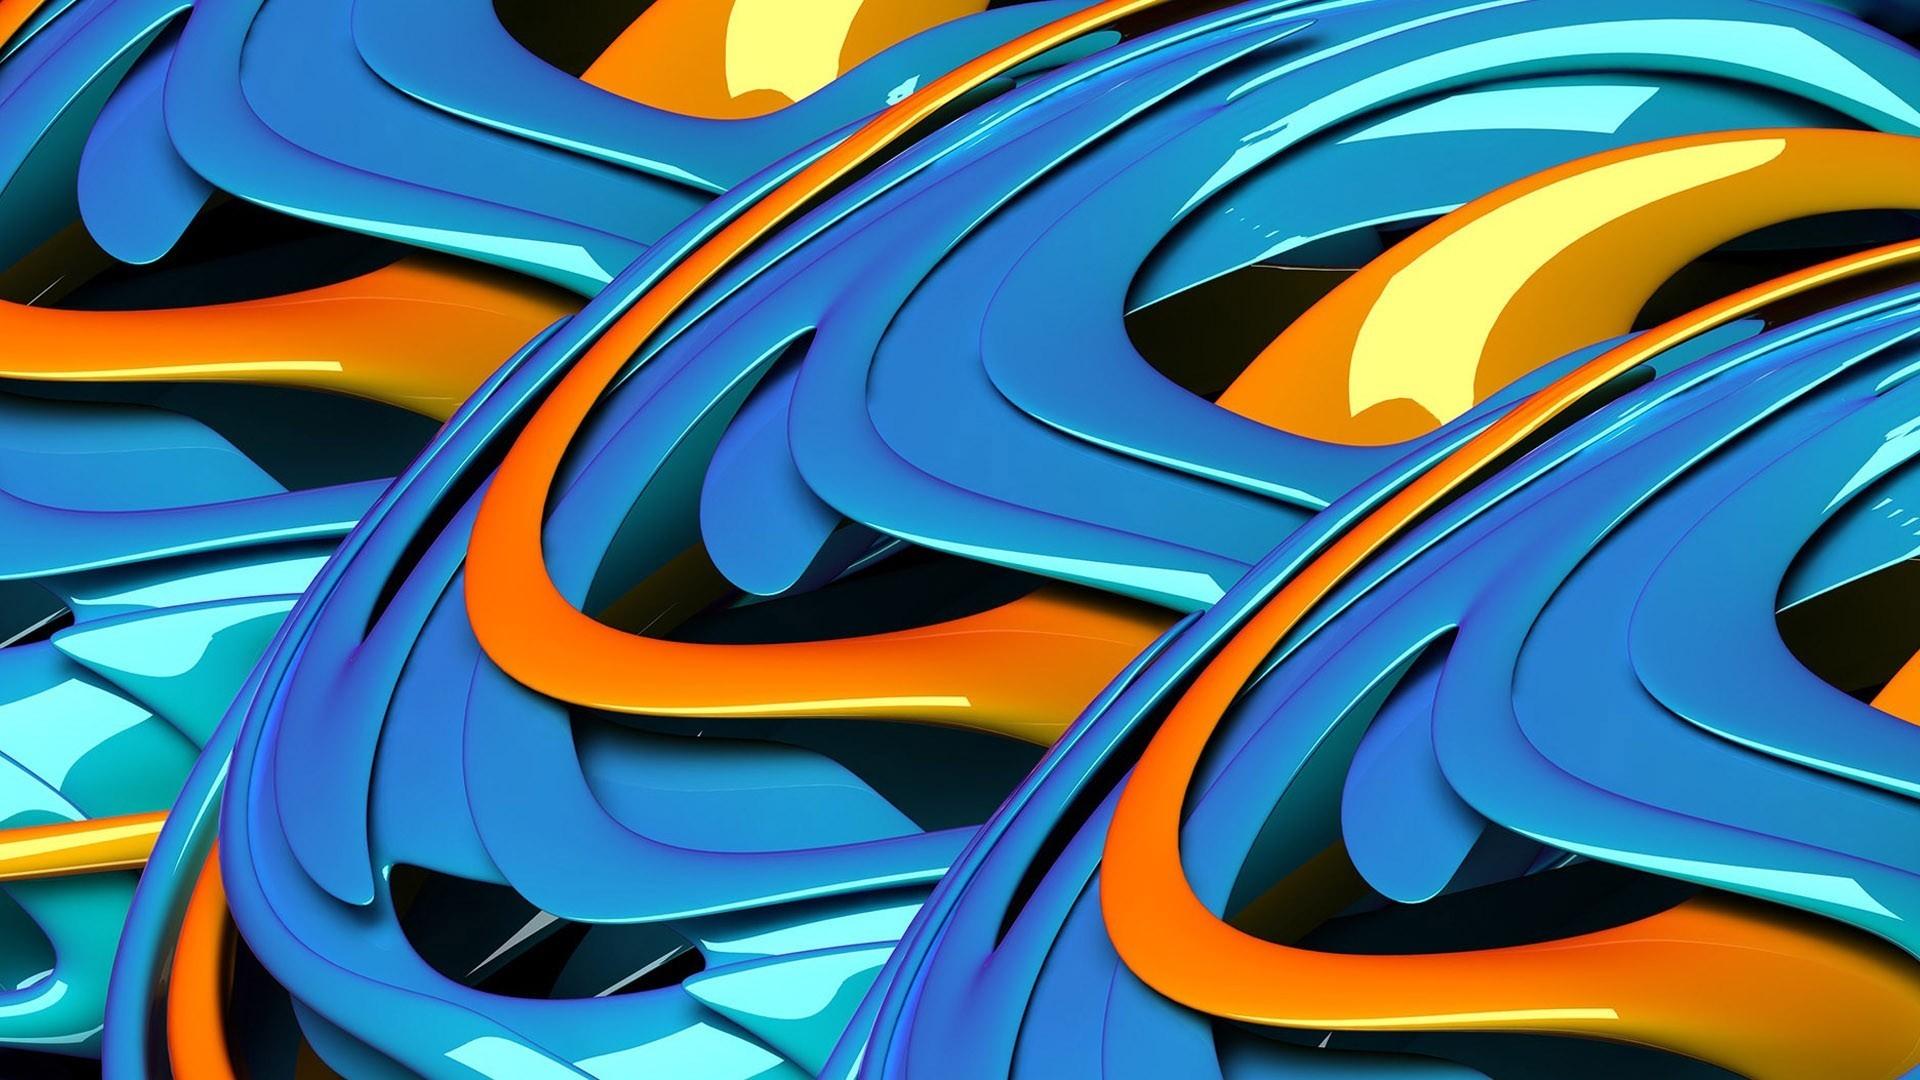 Blue And Orange Background: Blue Camo Wallpaper (47+ Images